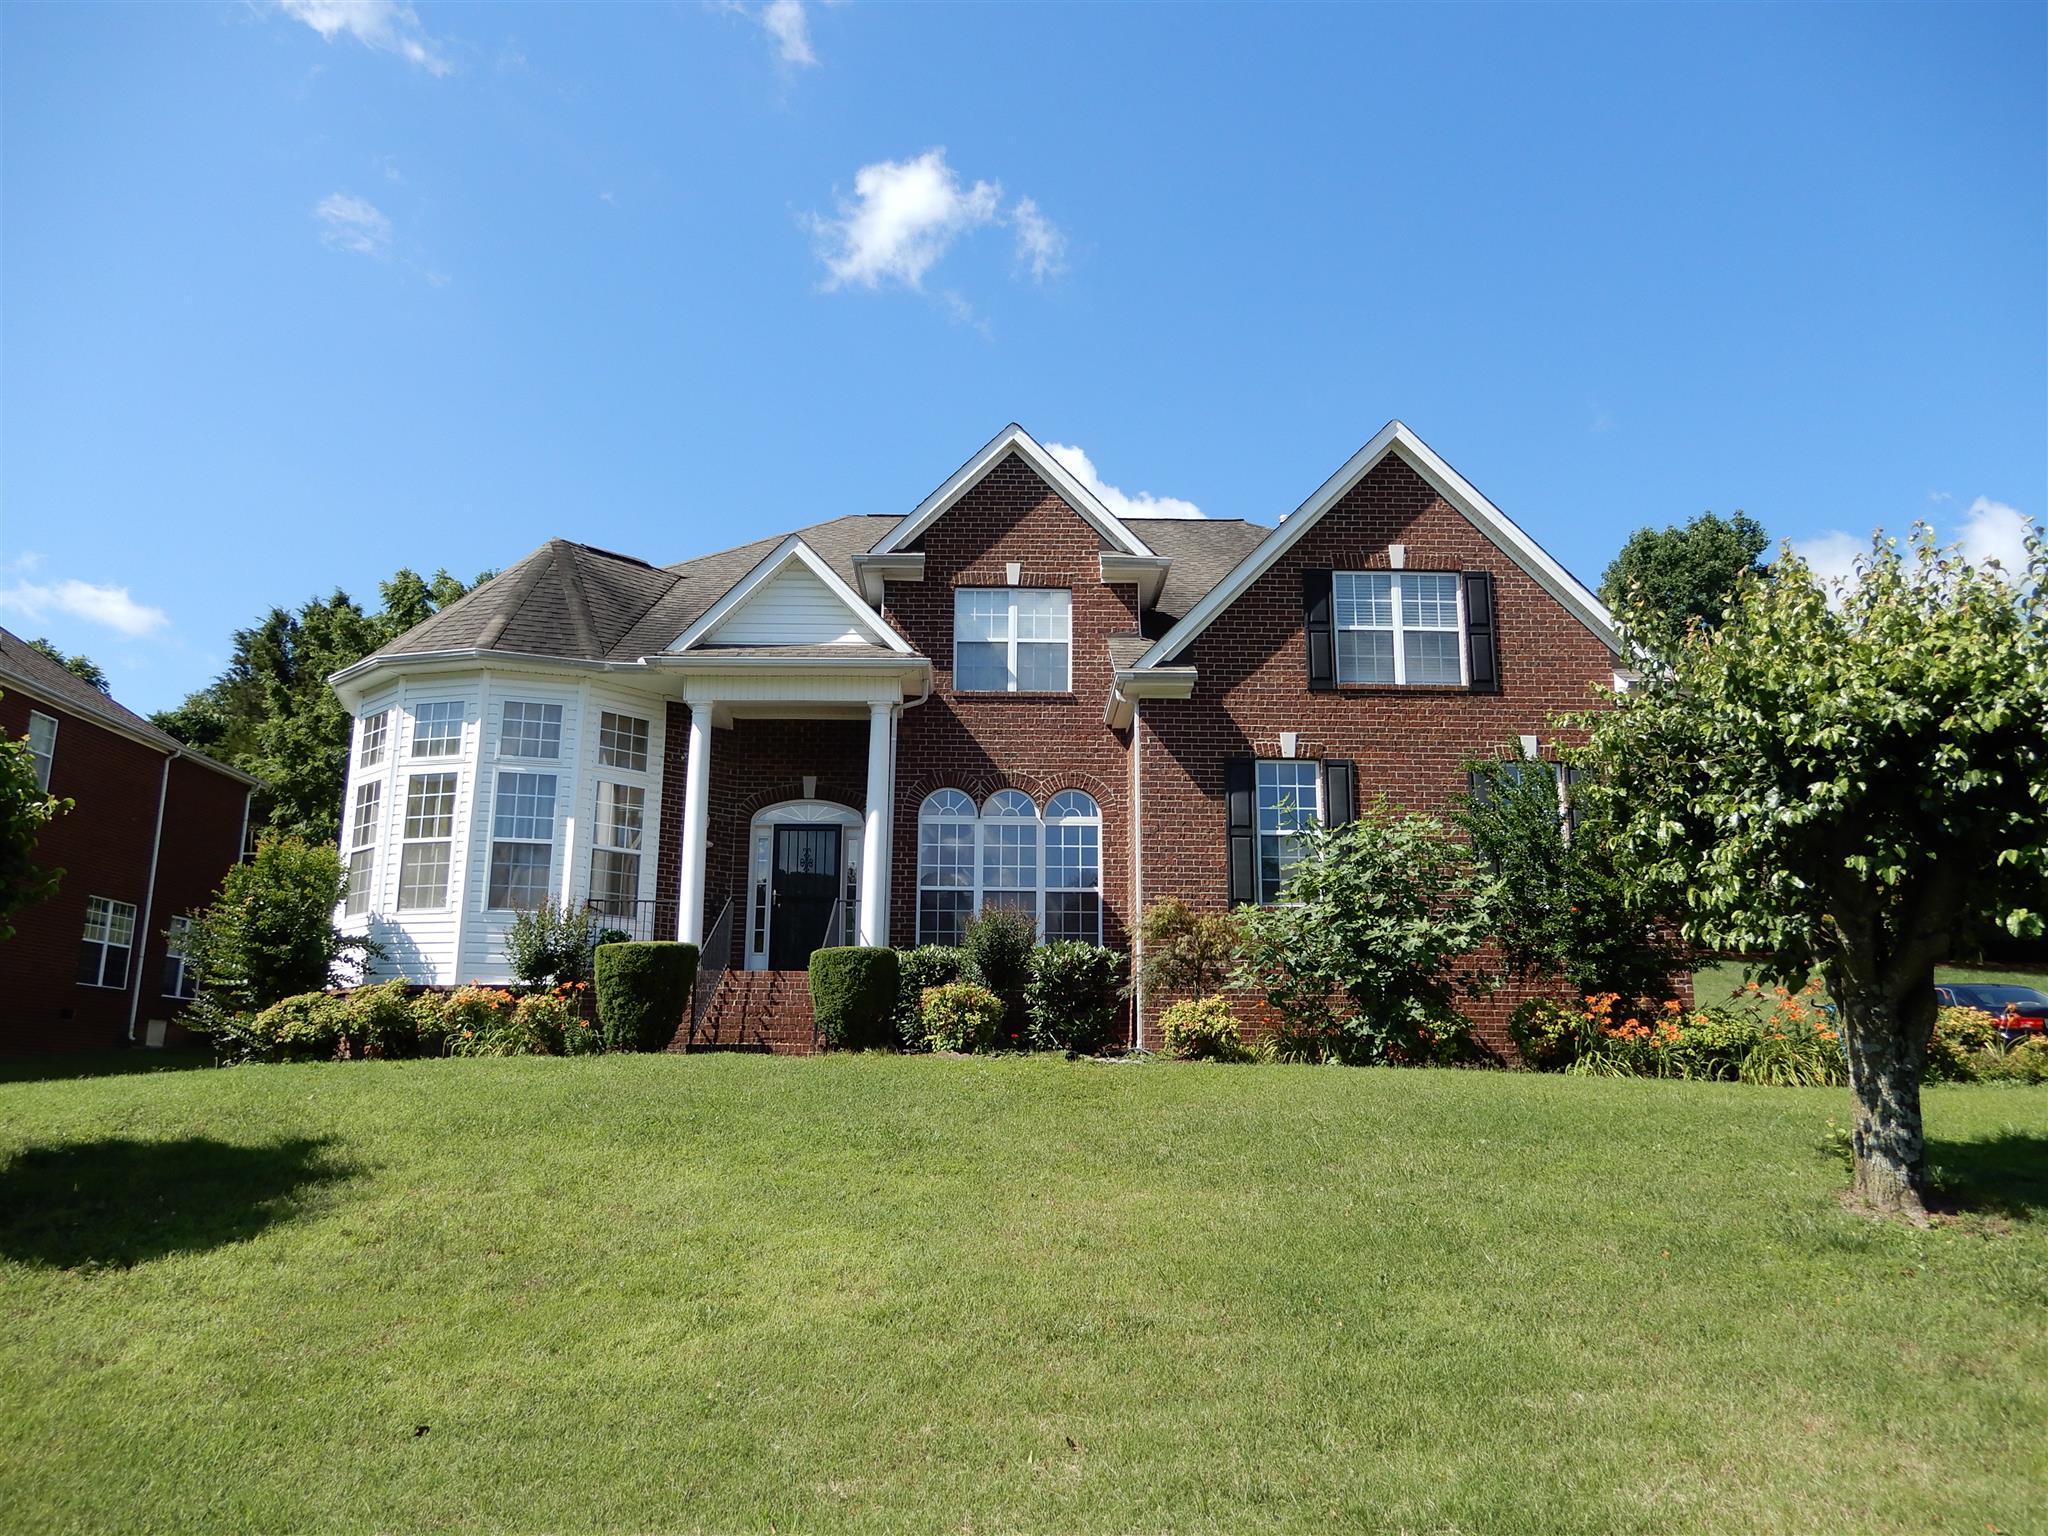 6057 Frontier Ln, Nashville, TN 37211 - Nashville, TN real estate listing